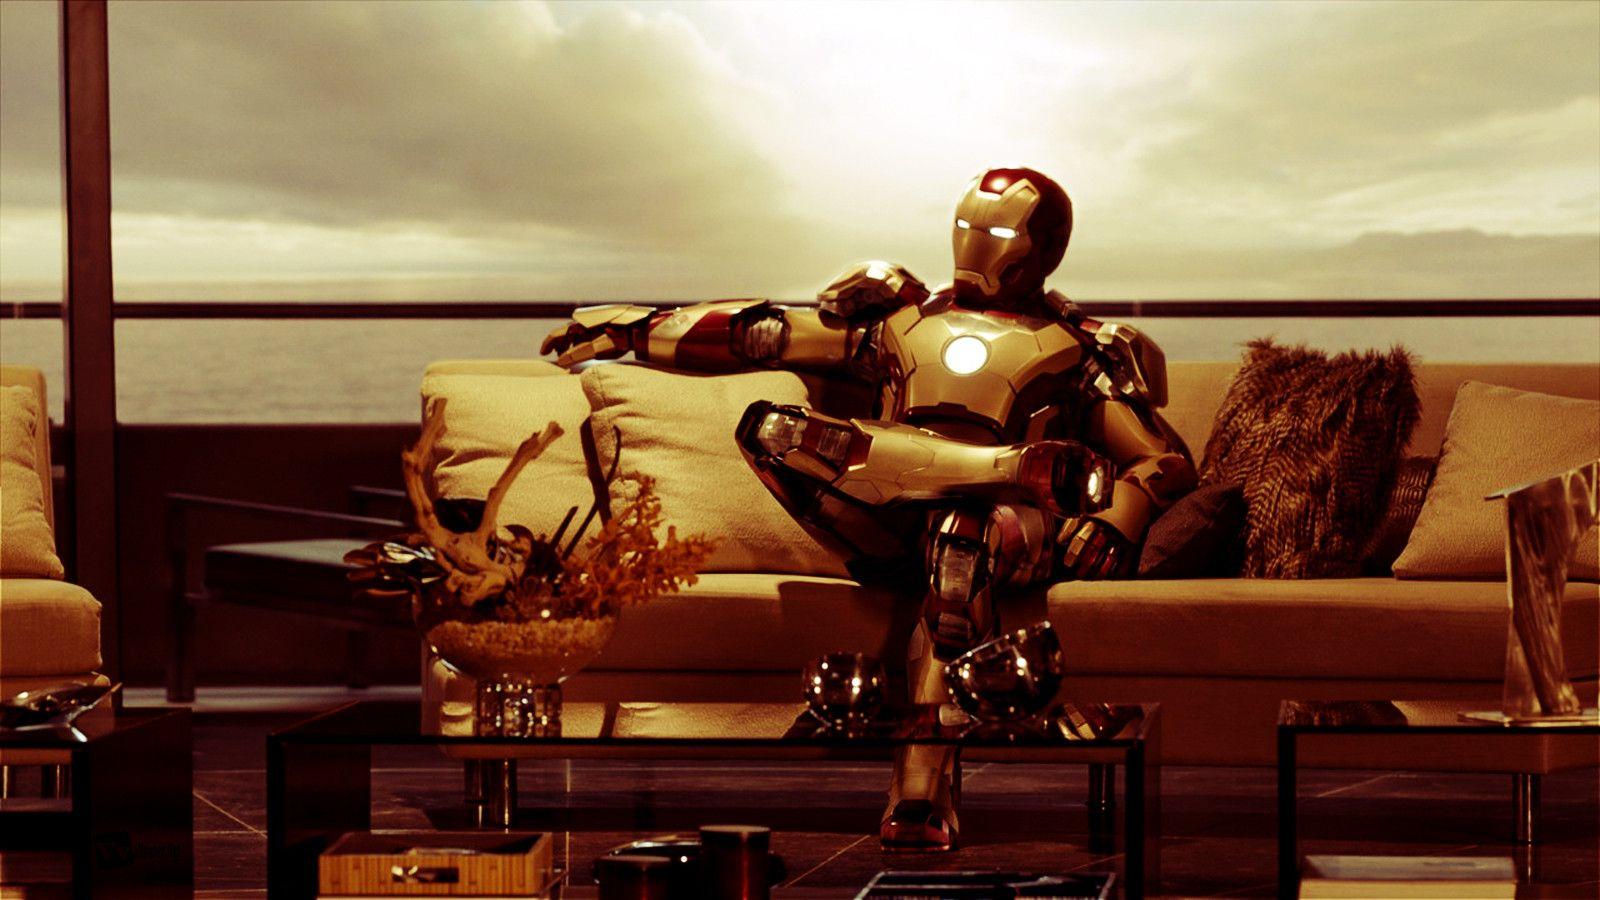 iron man wallpaper hd download